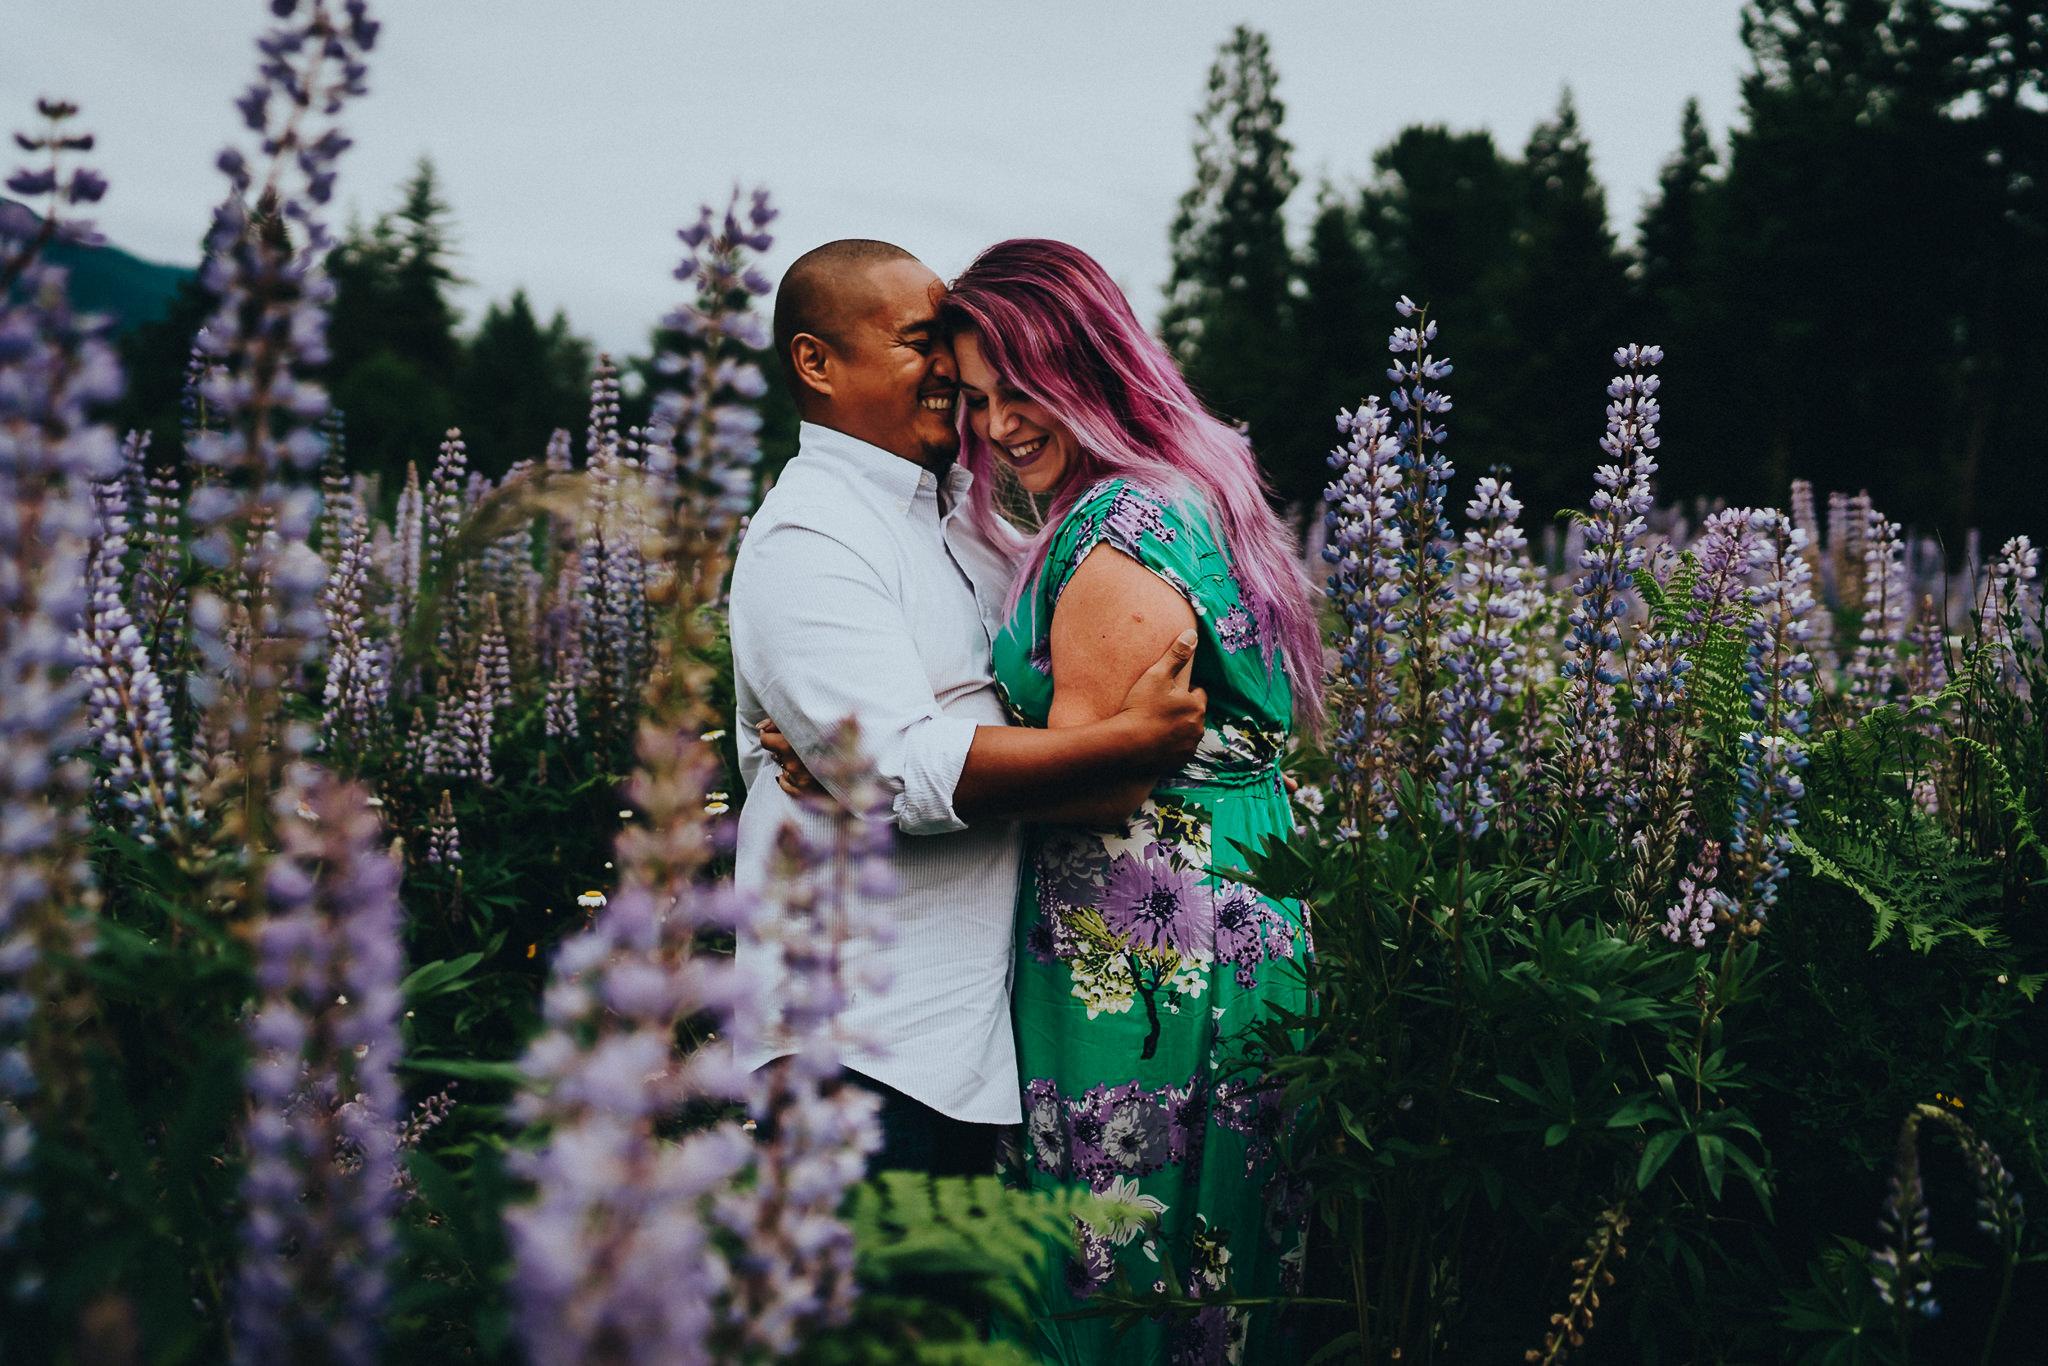 Lupine-Laughing-Portland-Photographer